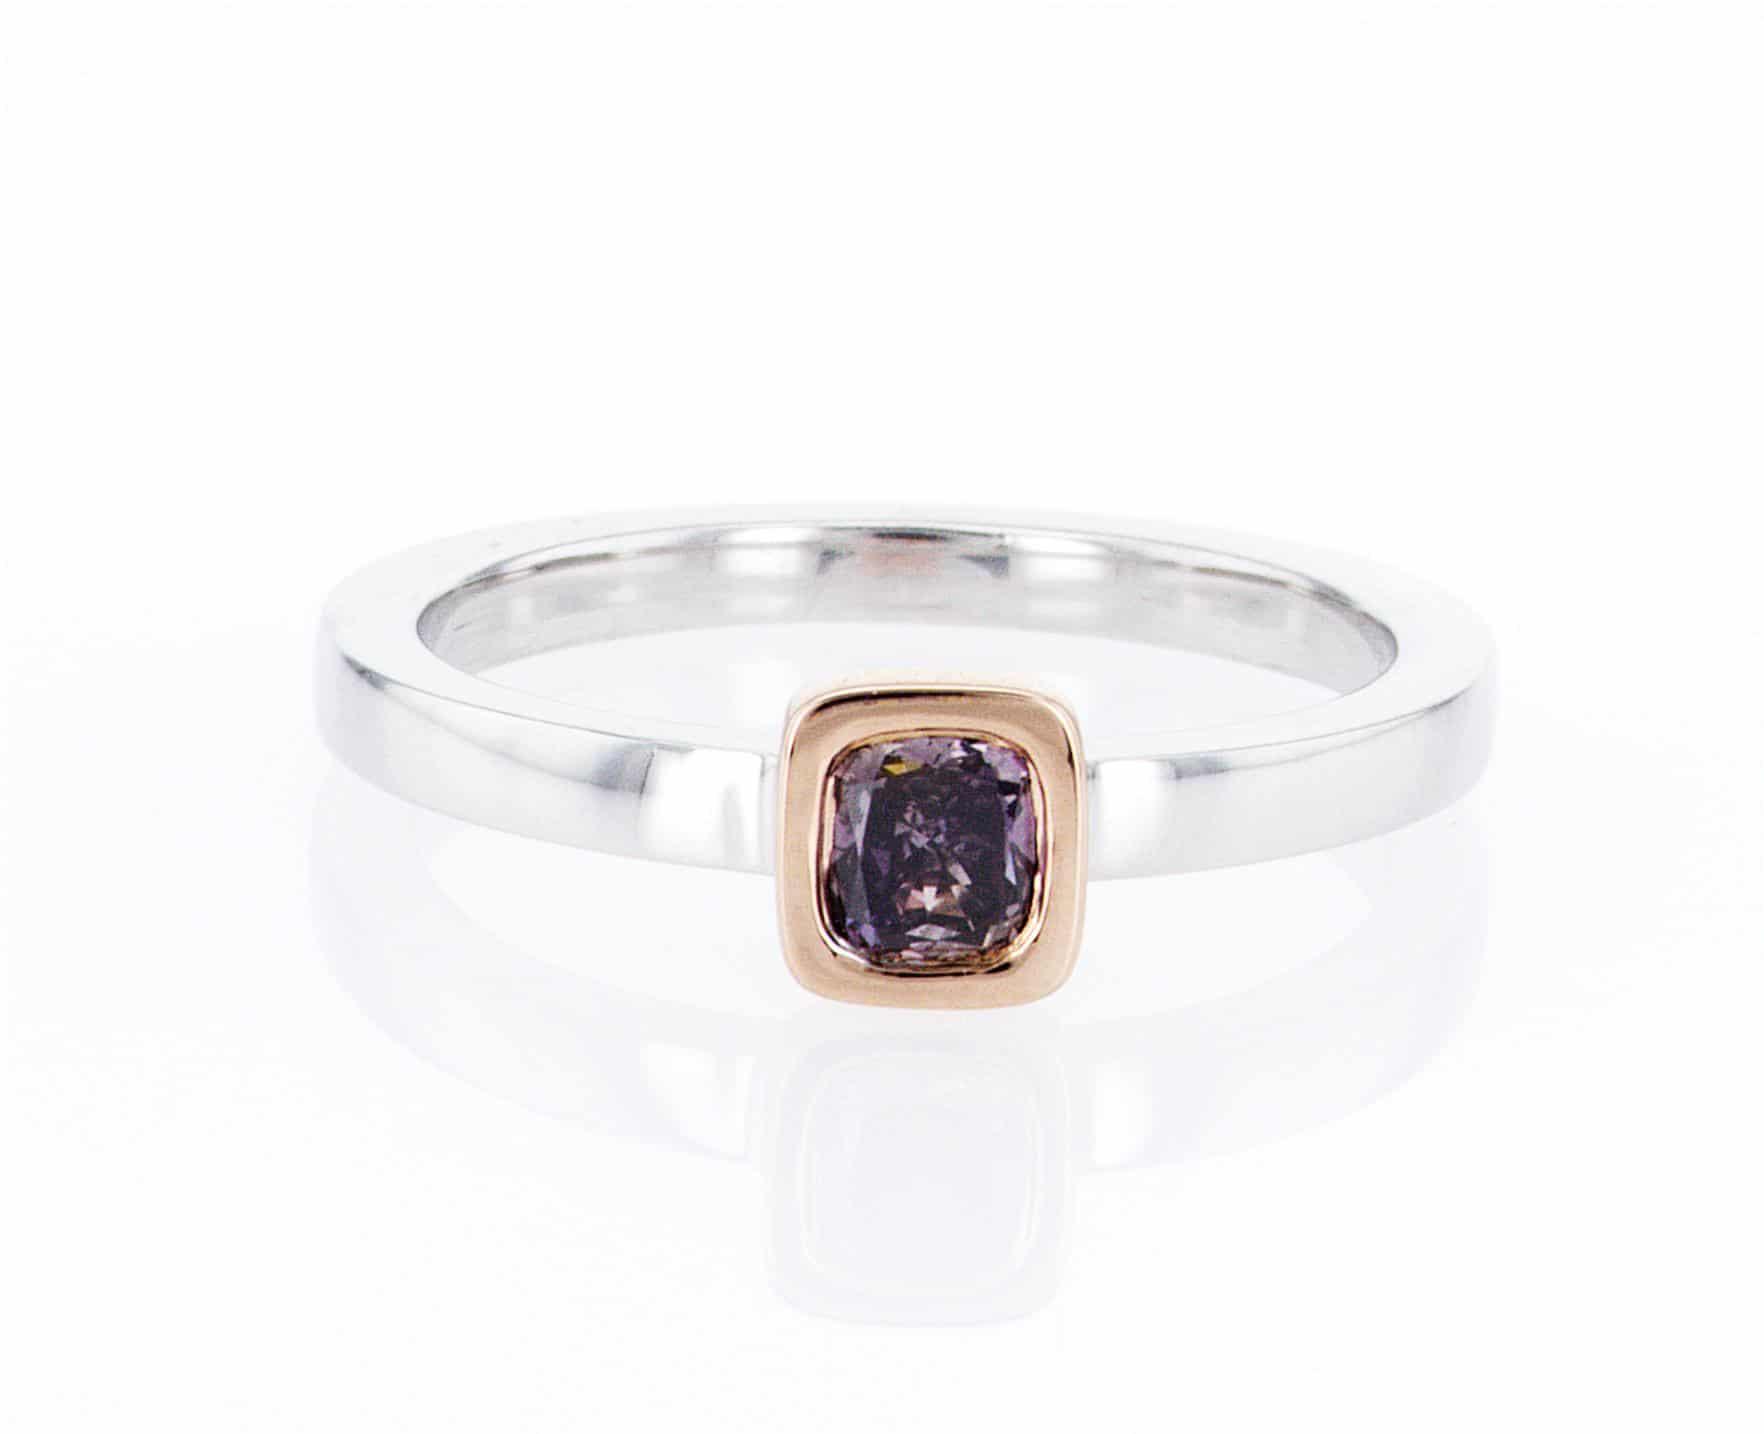 purple cushion diamond, white and rose gold stacking ring